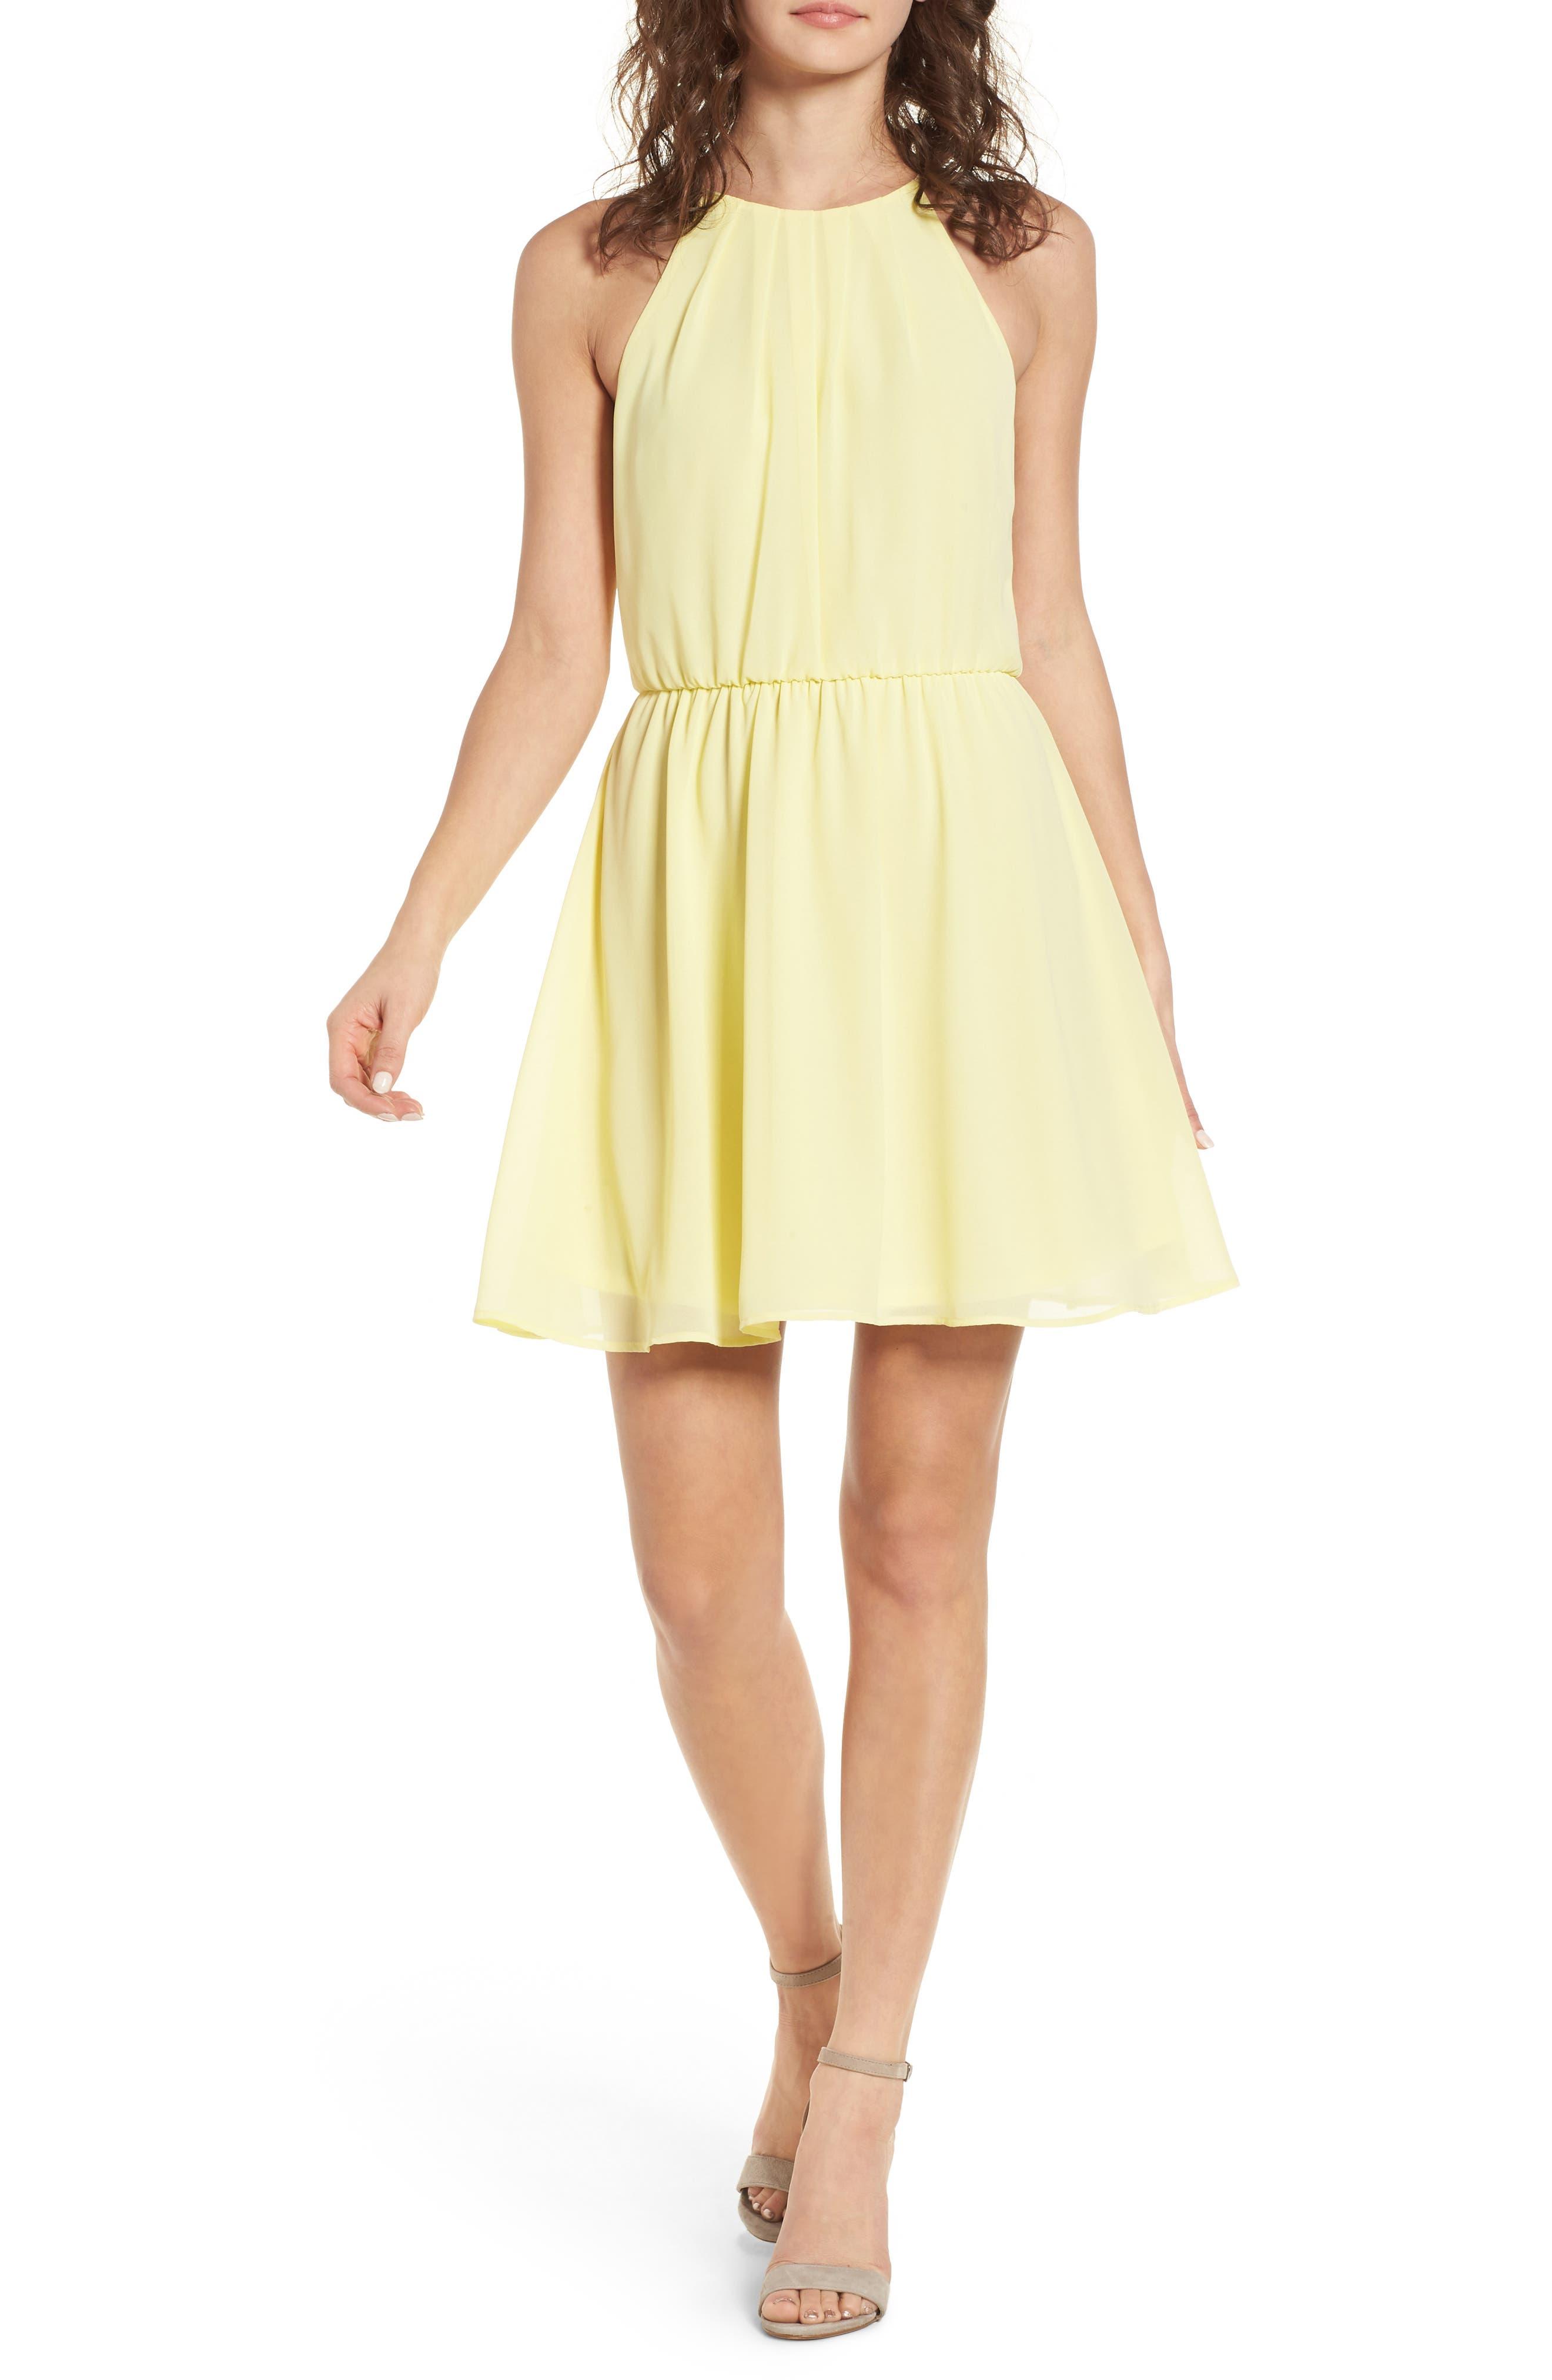 Blouson Chiffon Skater Dress,                         Main,                         color, Banana